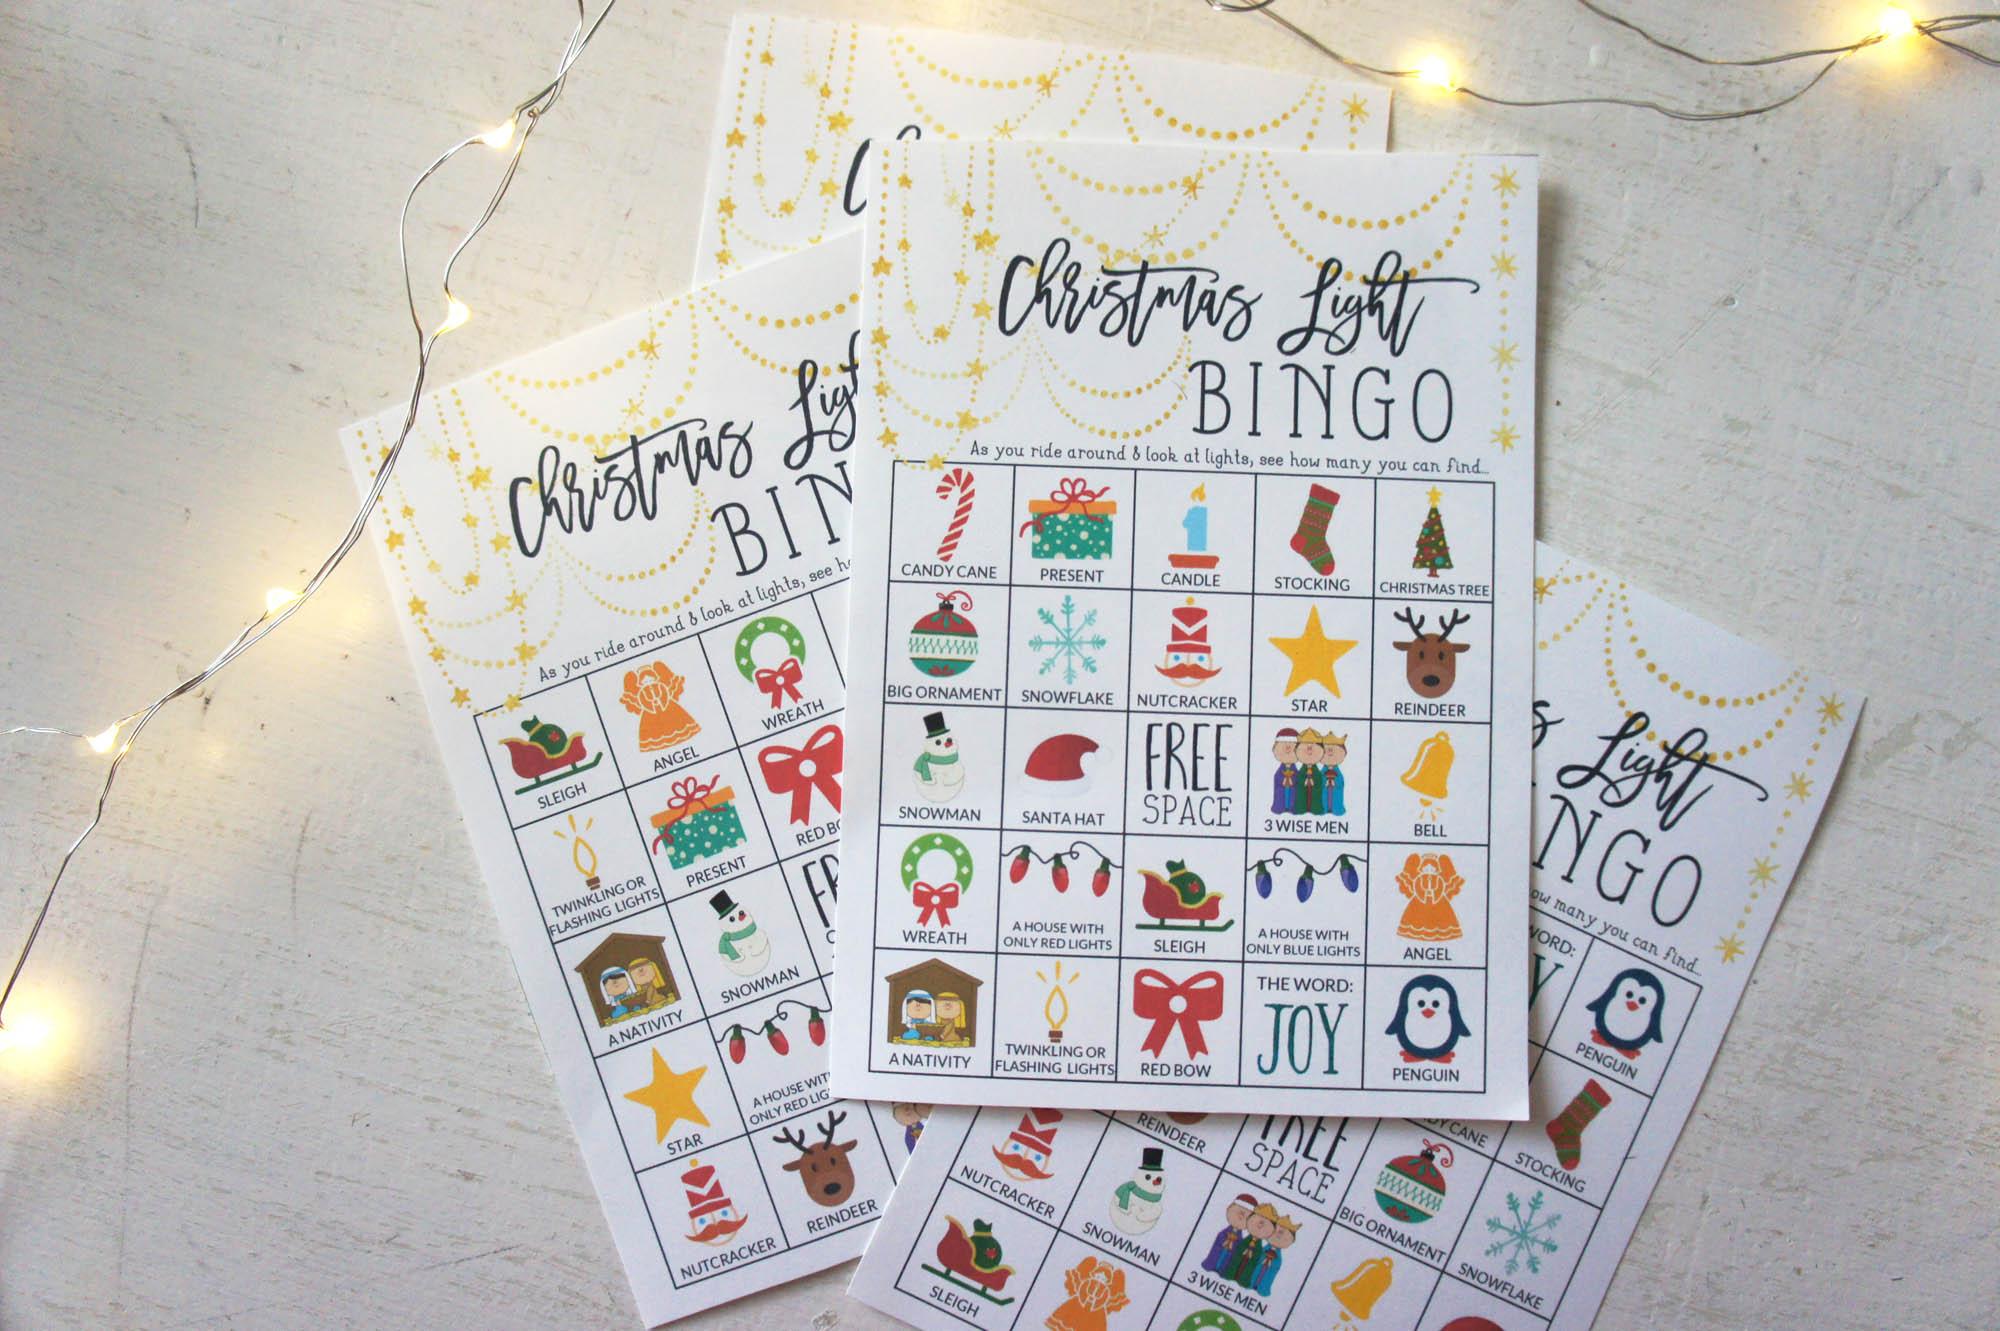 Christmas Light Bingo Cards from Little House Studio